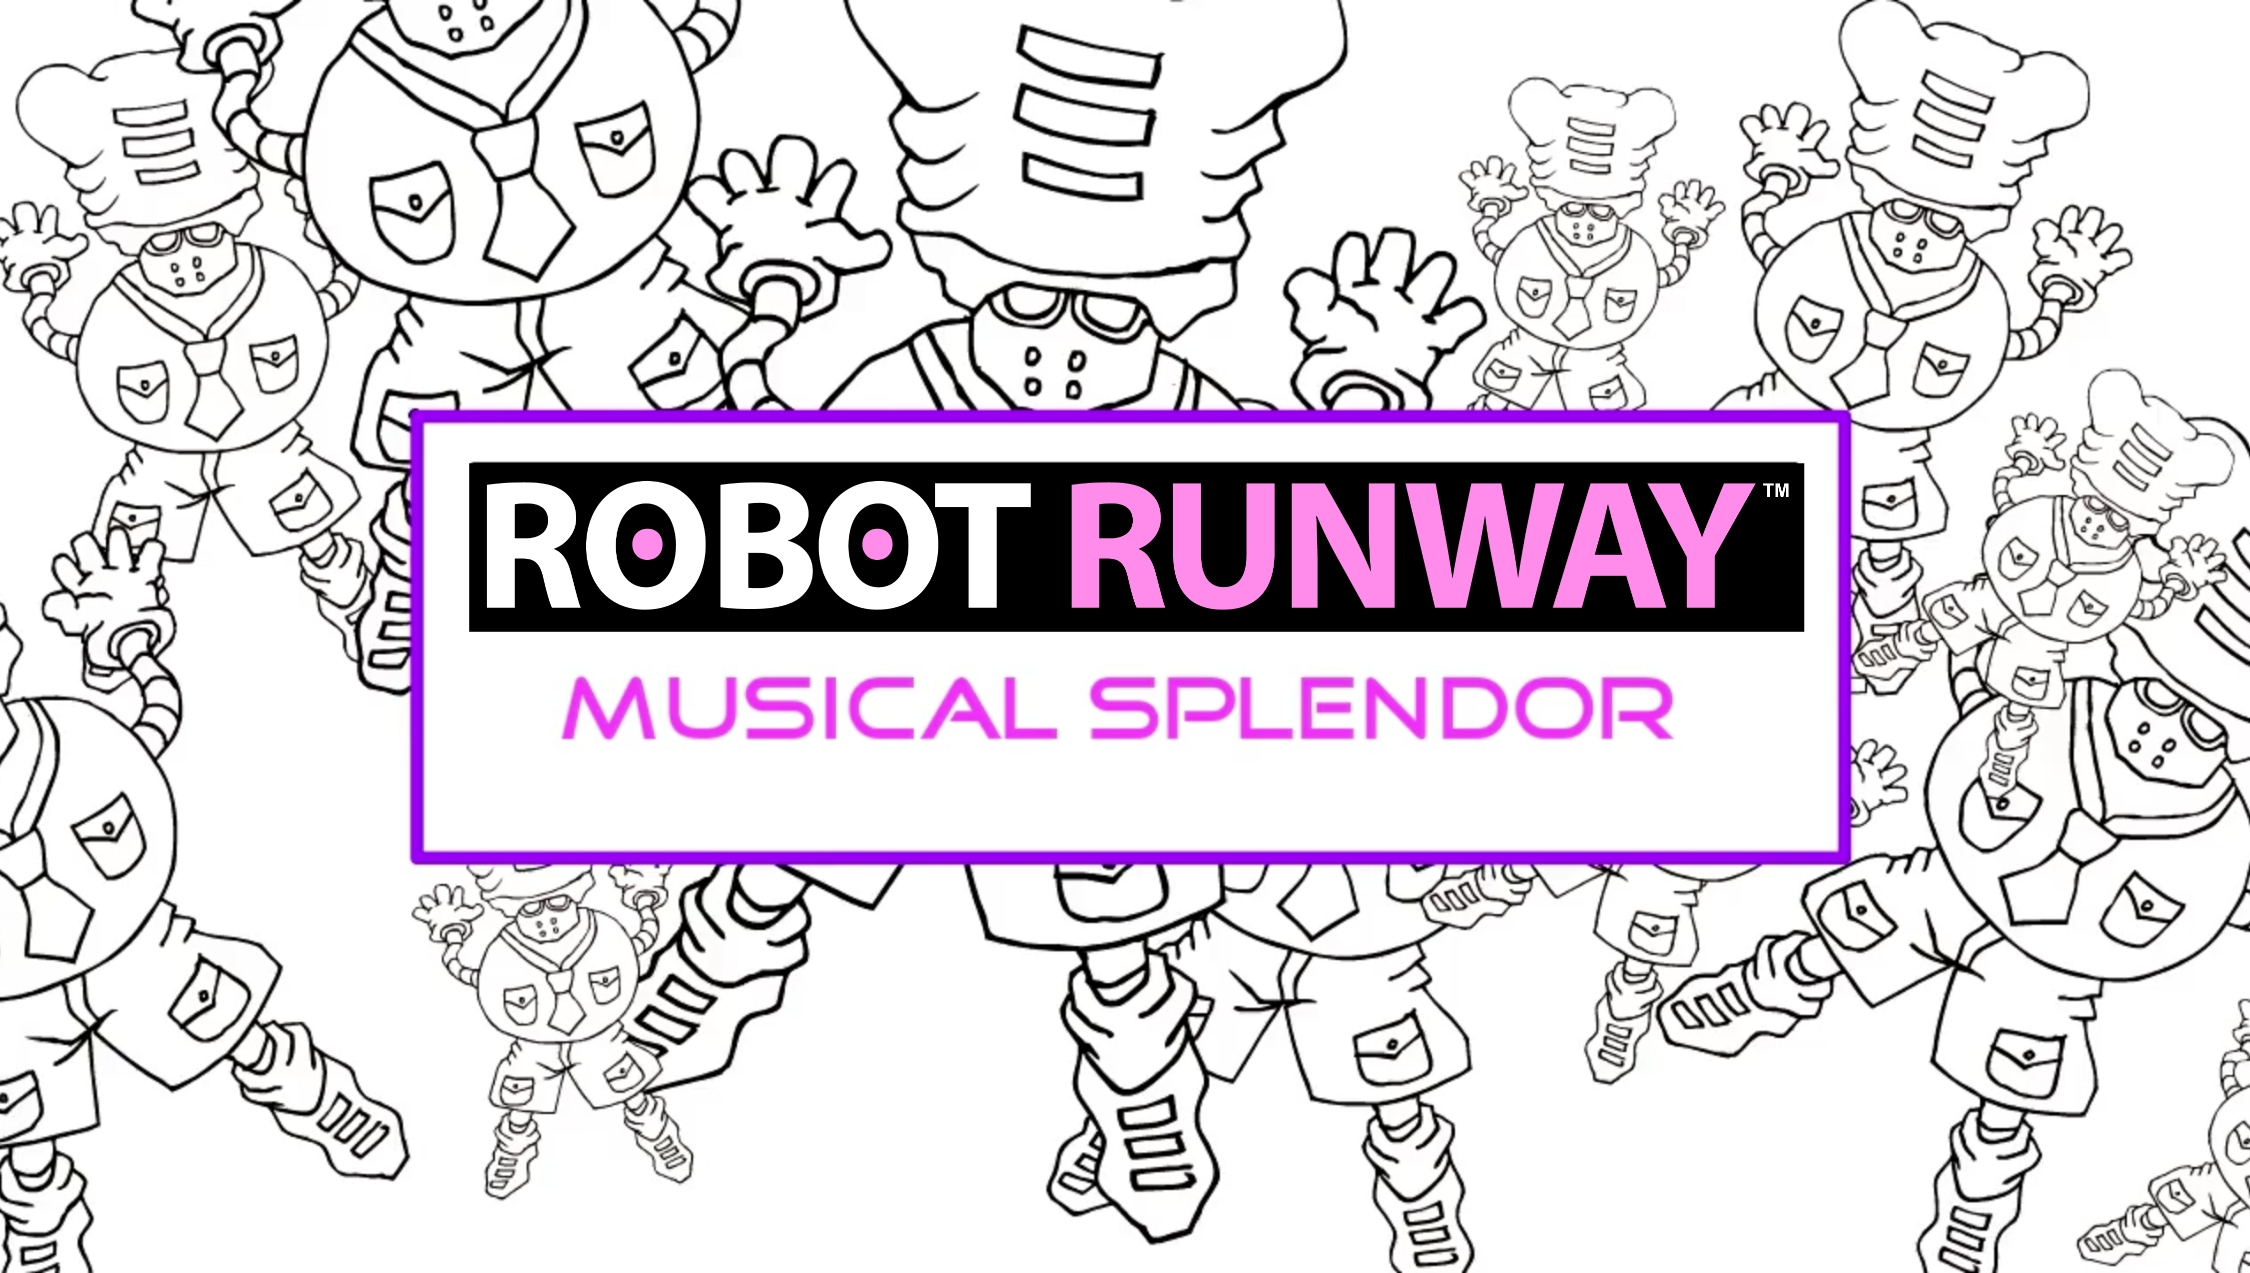 Robot Runway™ Musical Splendor Video